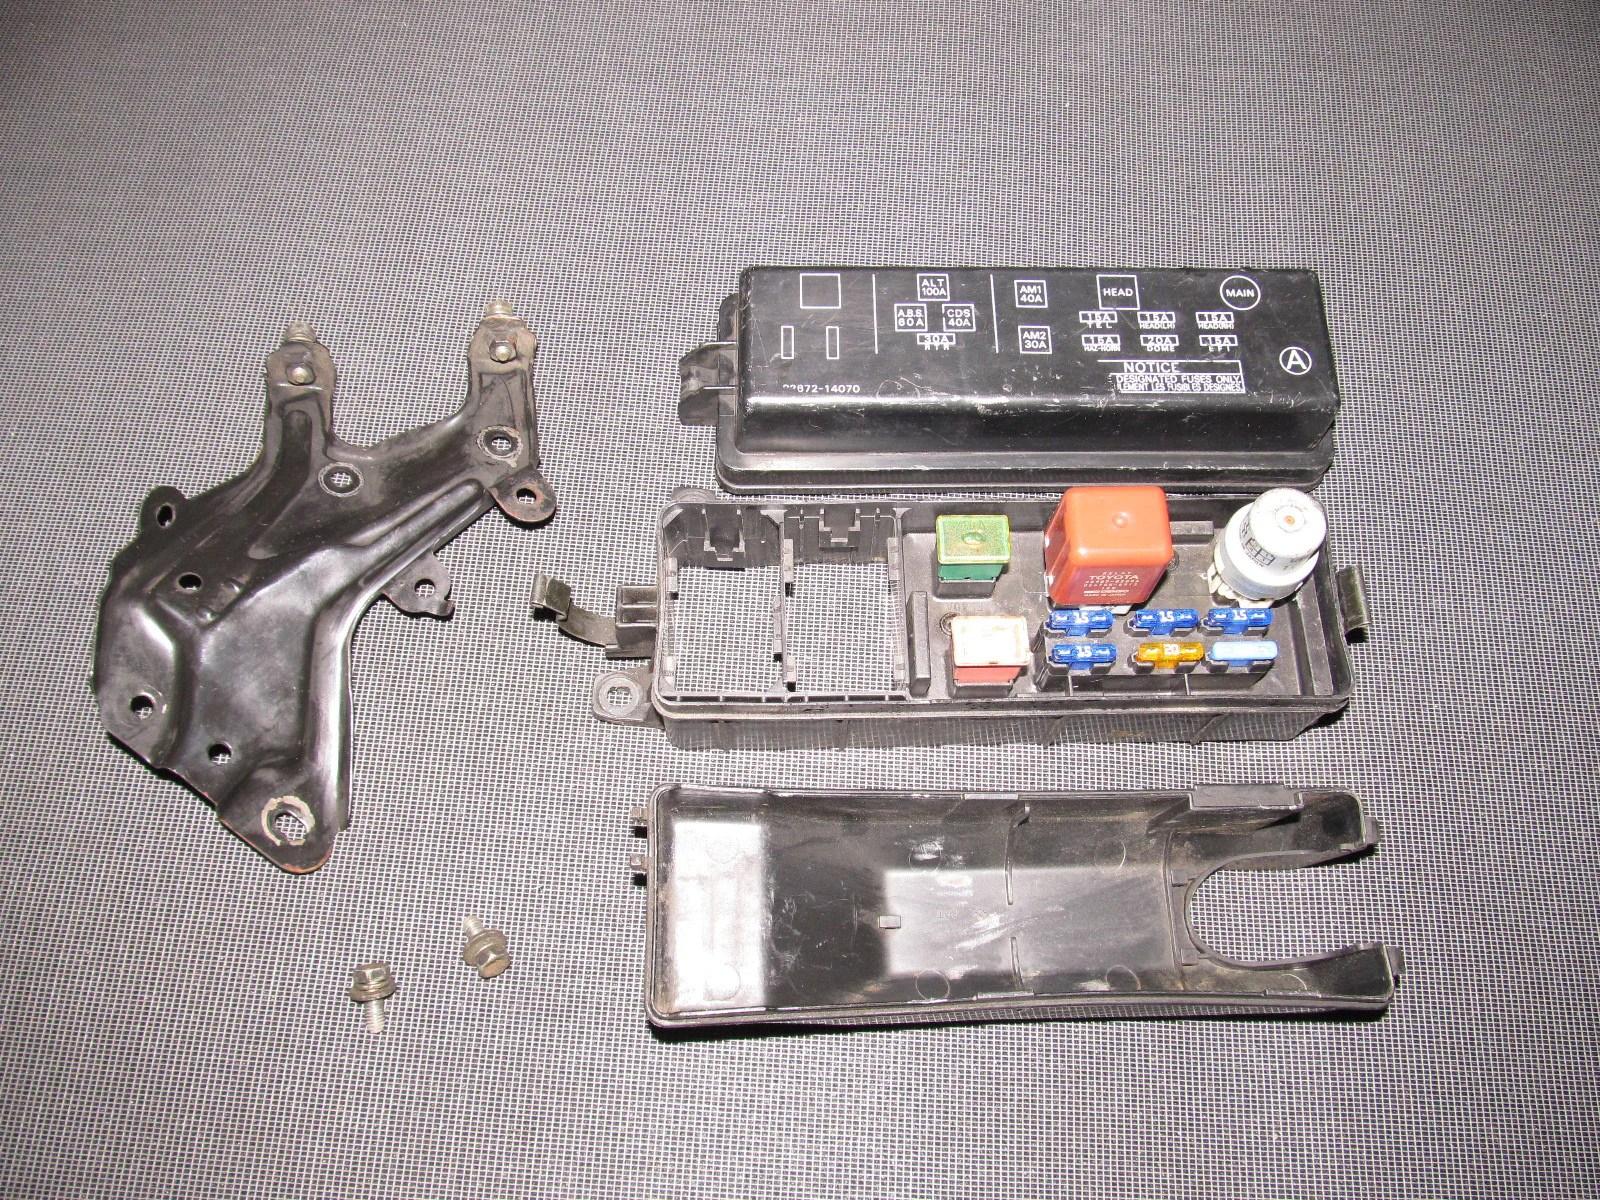 89 corolla fuse box wiring library89 90 91 92 toyota supra oem engine fuse box autopartone [ 1600 x 1200 Pixel ]